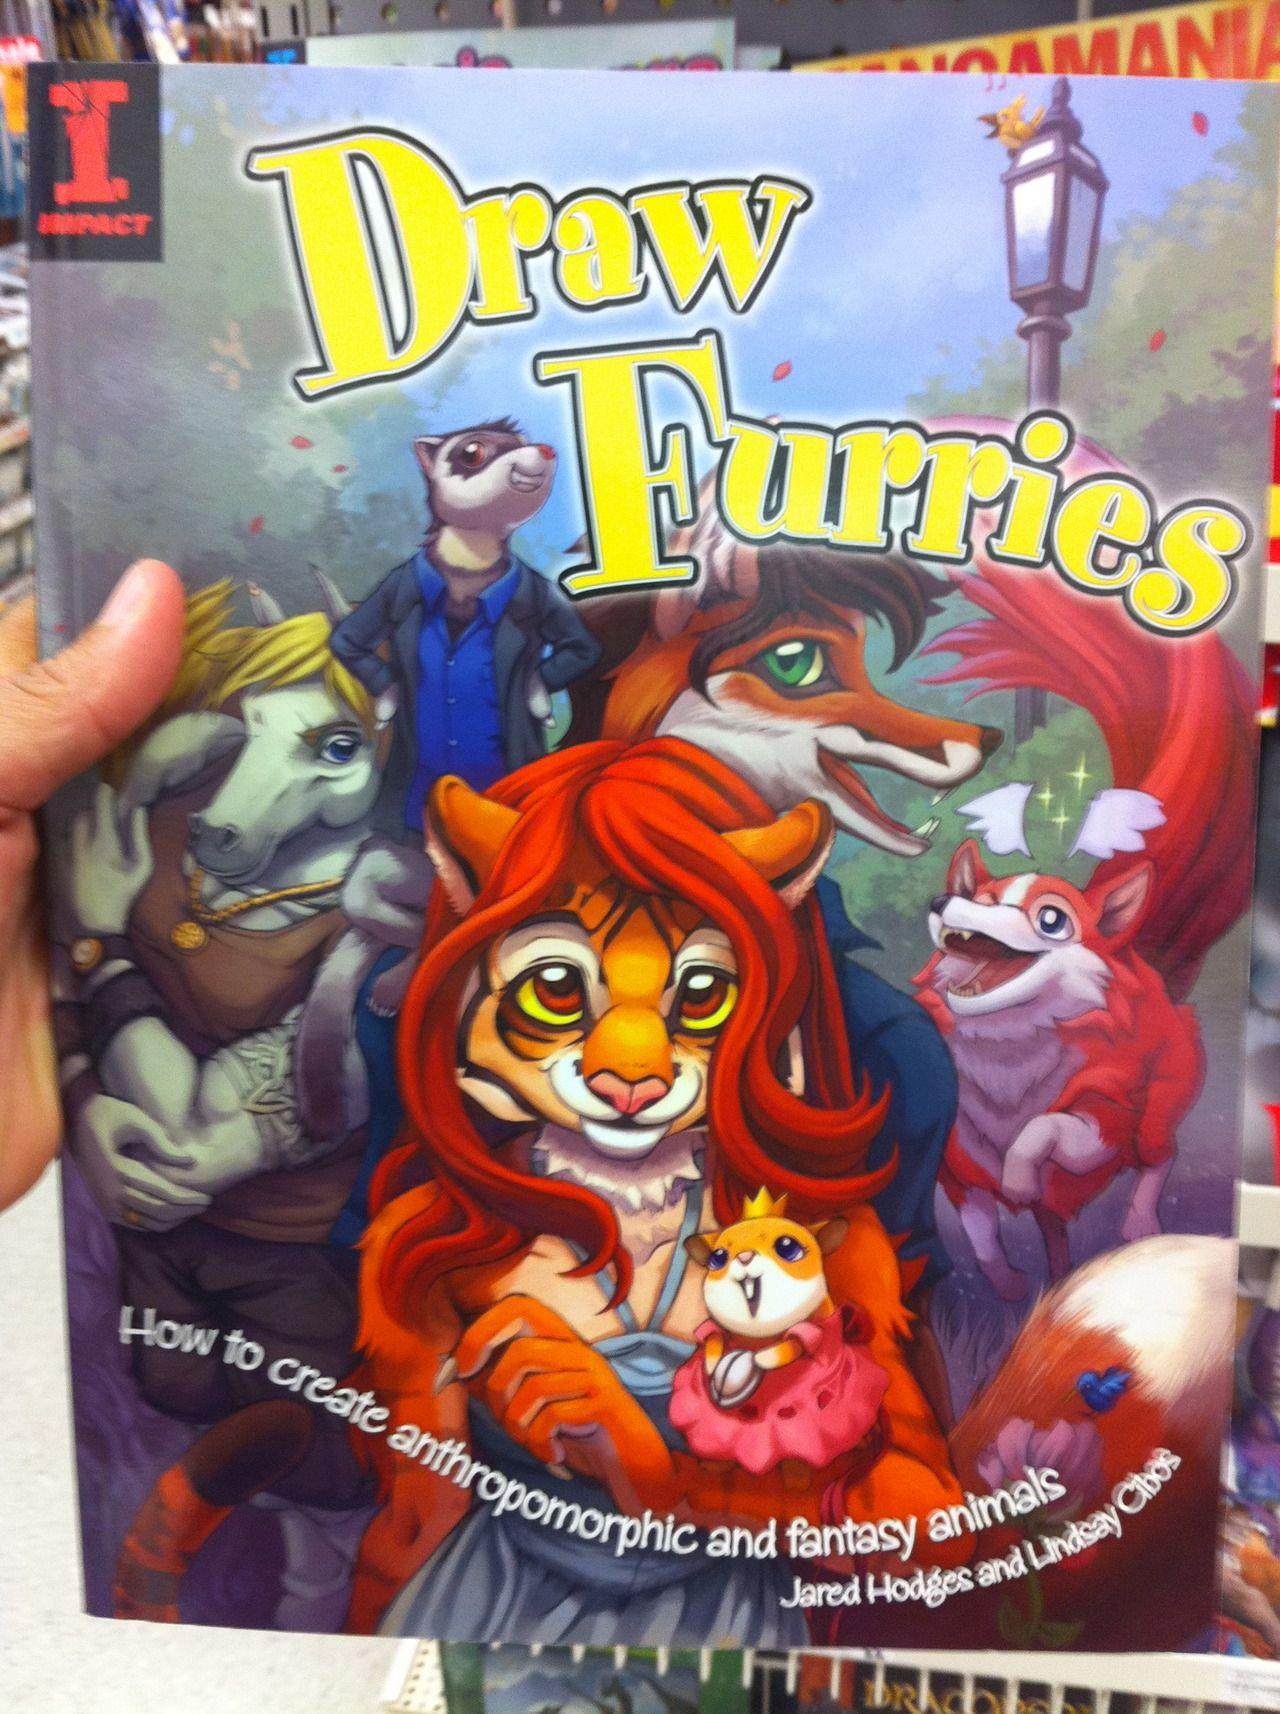 draw furries cibos lindsay hodges jared